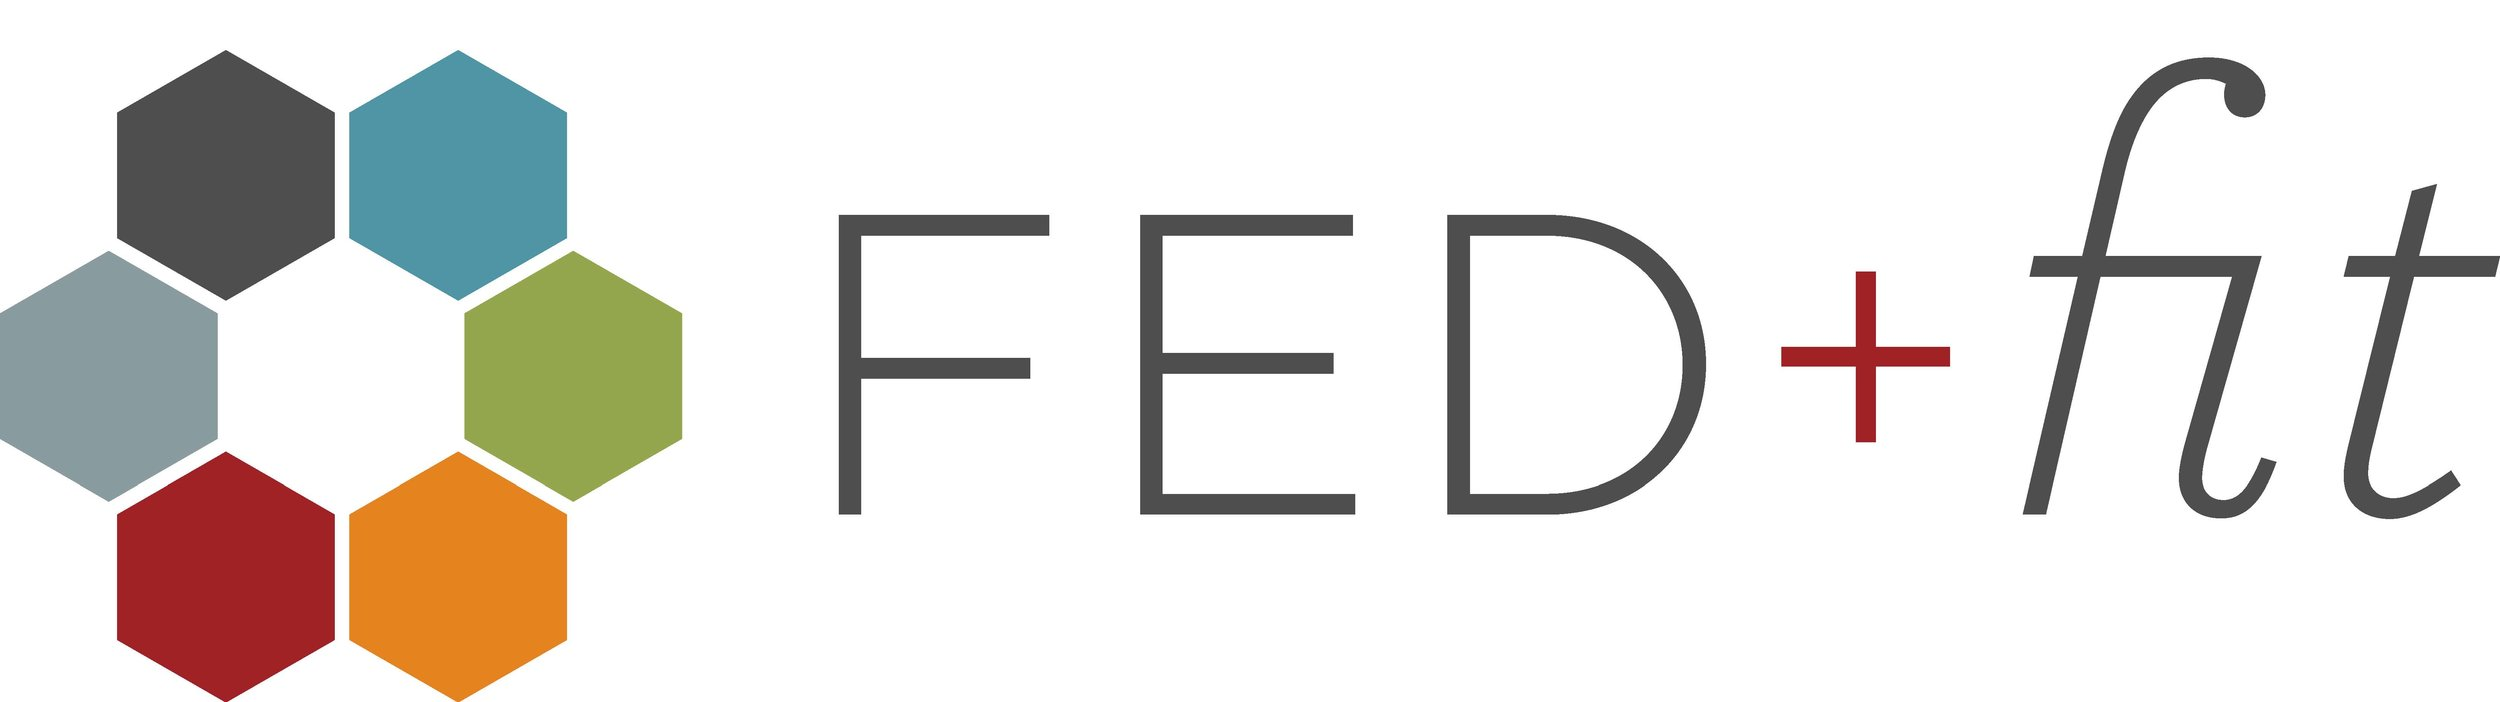 3W8O3I3dS5S9cFJX0P8l_fedandfit_logo.FINAL.jpg